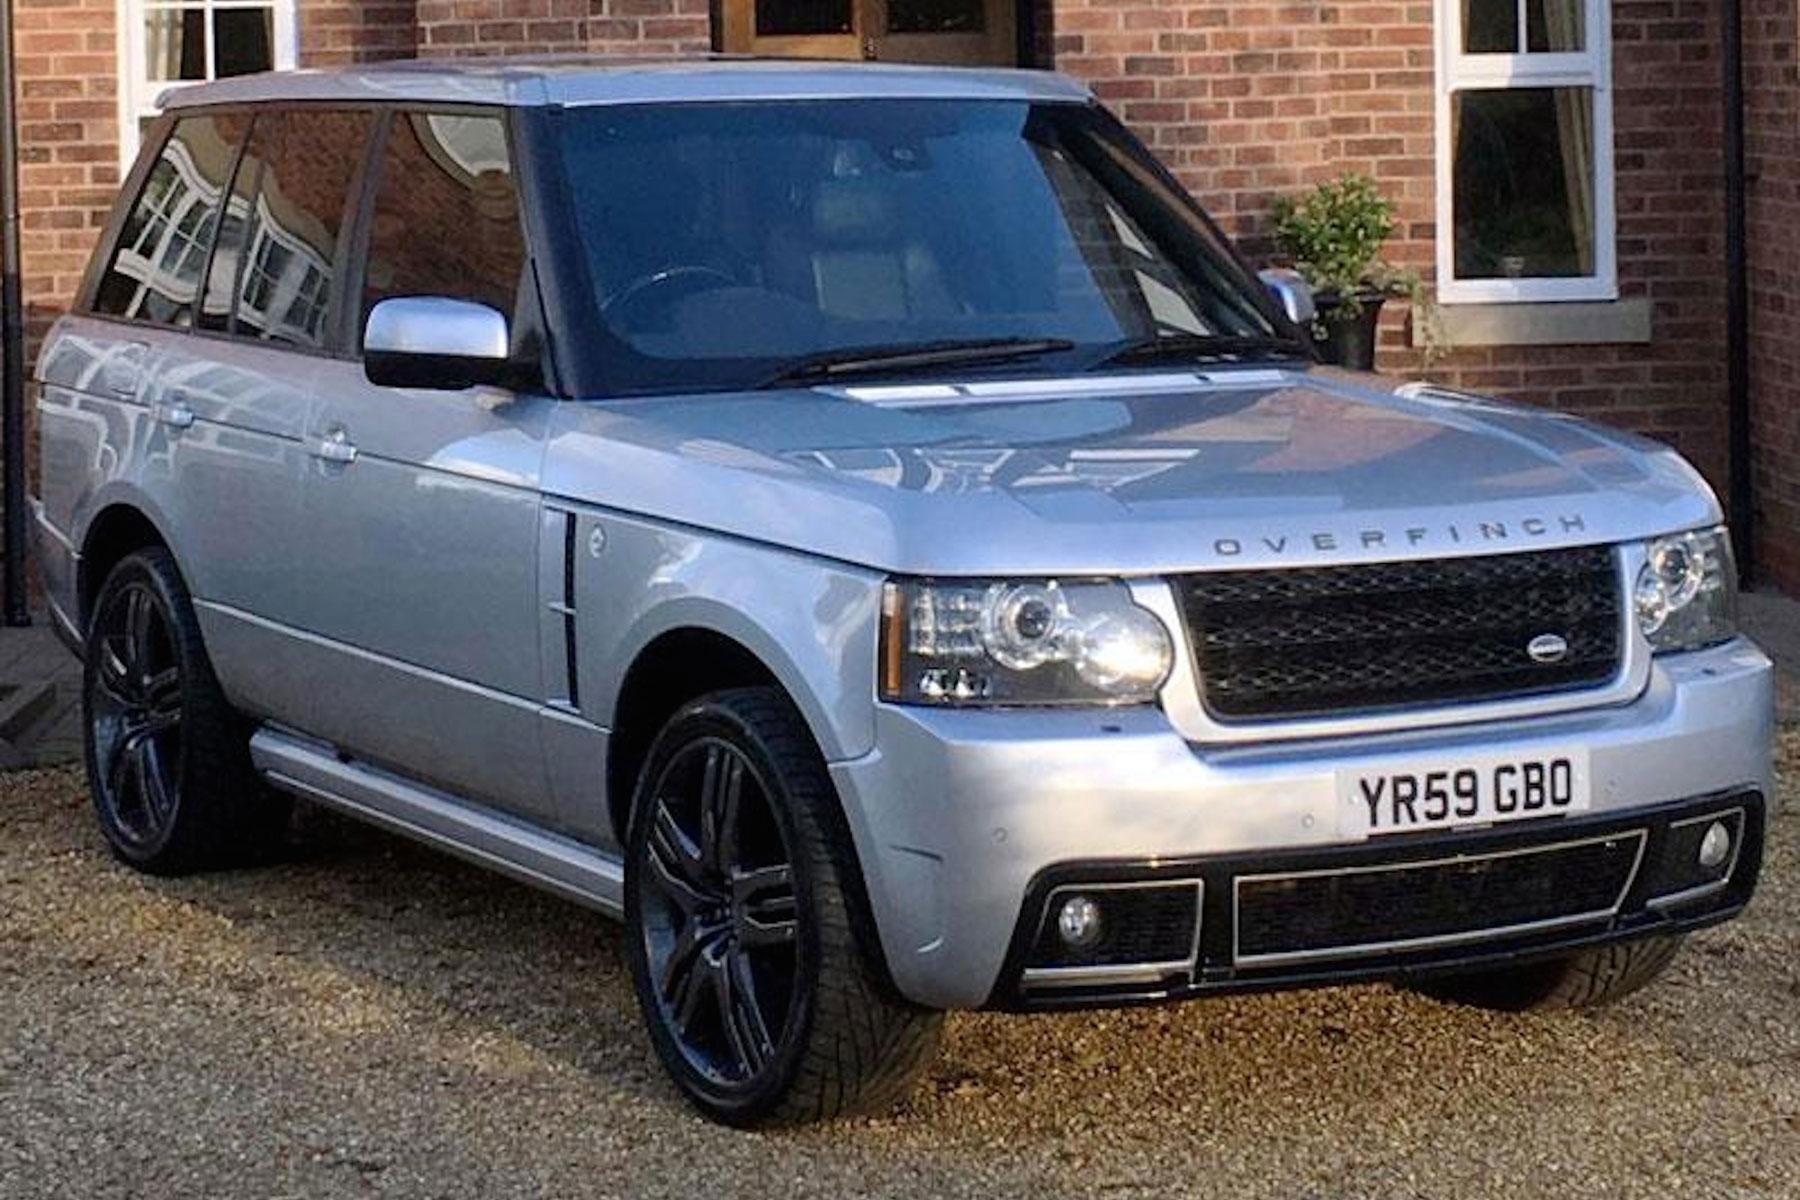 Wayne Rooney Range Rover